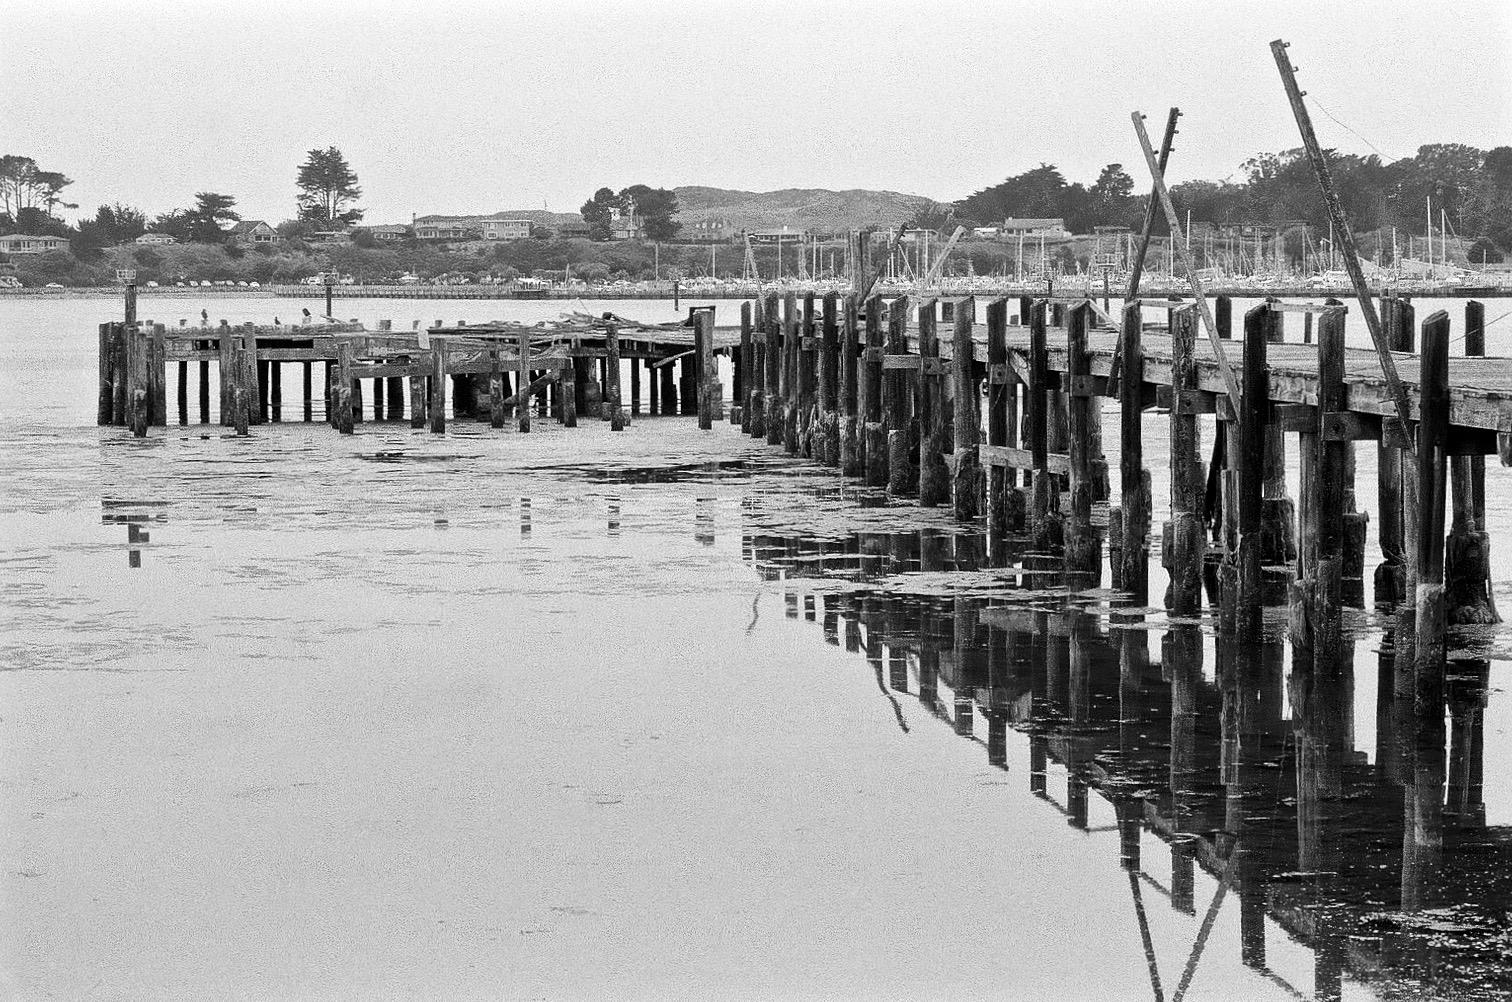 The old pier at Bodega Bay. Nikon F2A, 85mm f/1.4 Nikkor